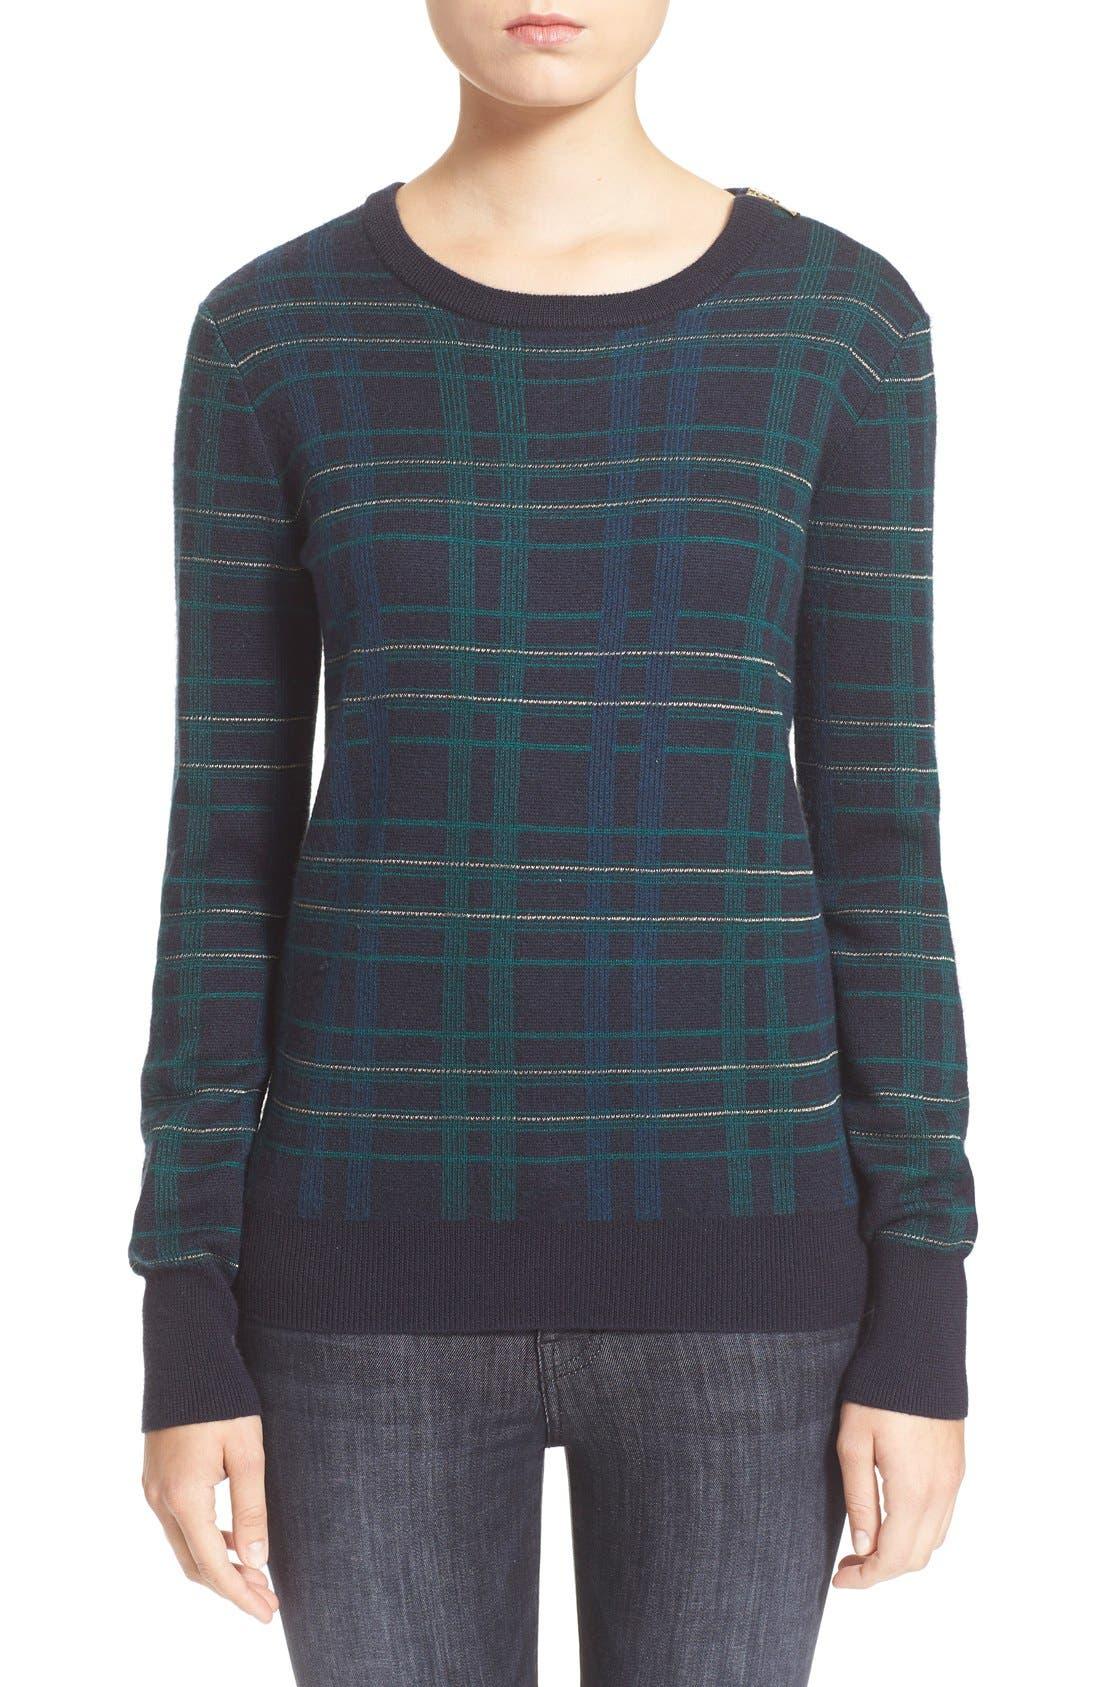 Alternate Image 1 Selected - Equipment 'Ondine' Plaid Wool Pullover